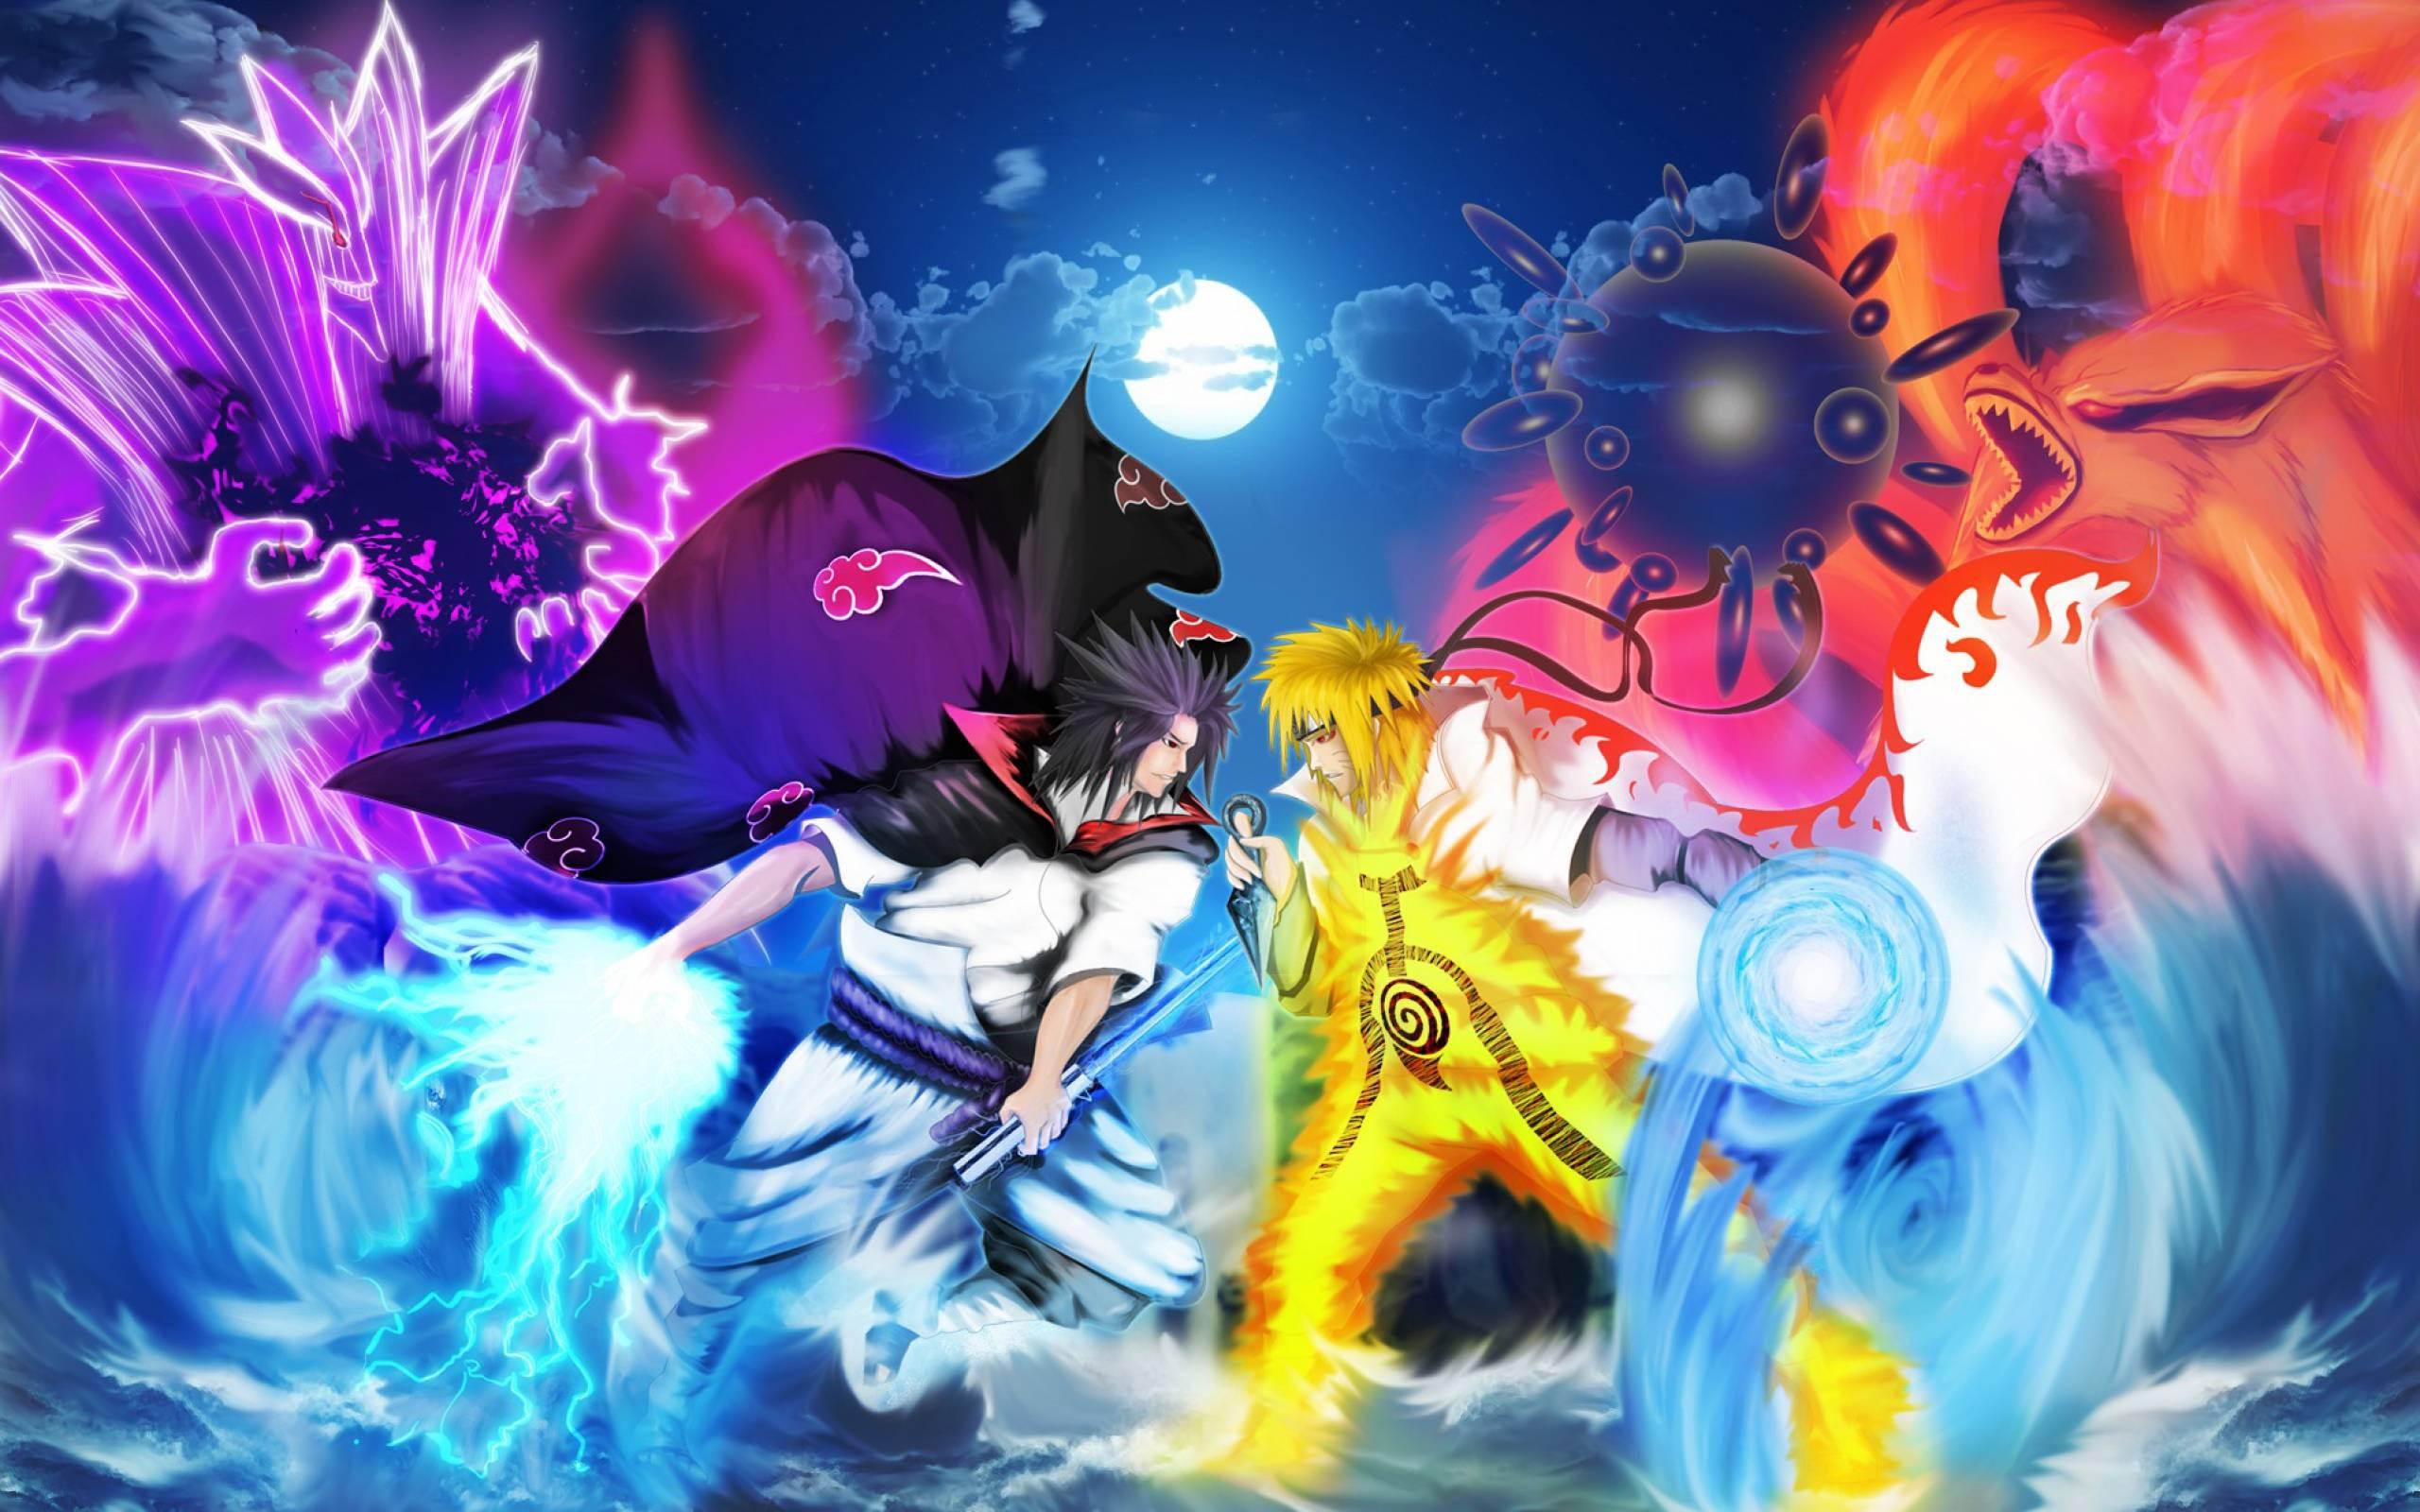 Sasuke And Naruto Shippuden Wallpapers - Wallpaper Cave